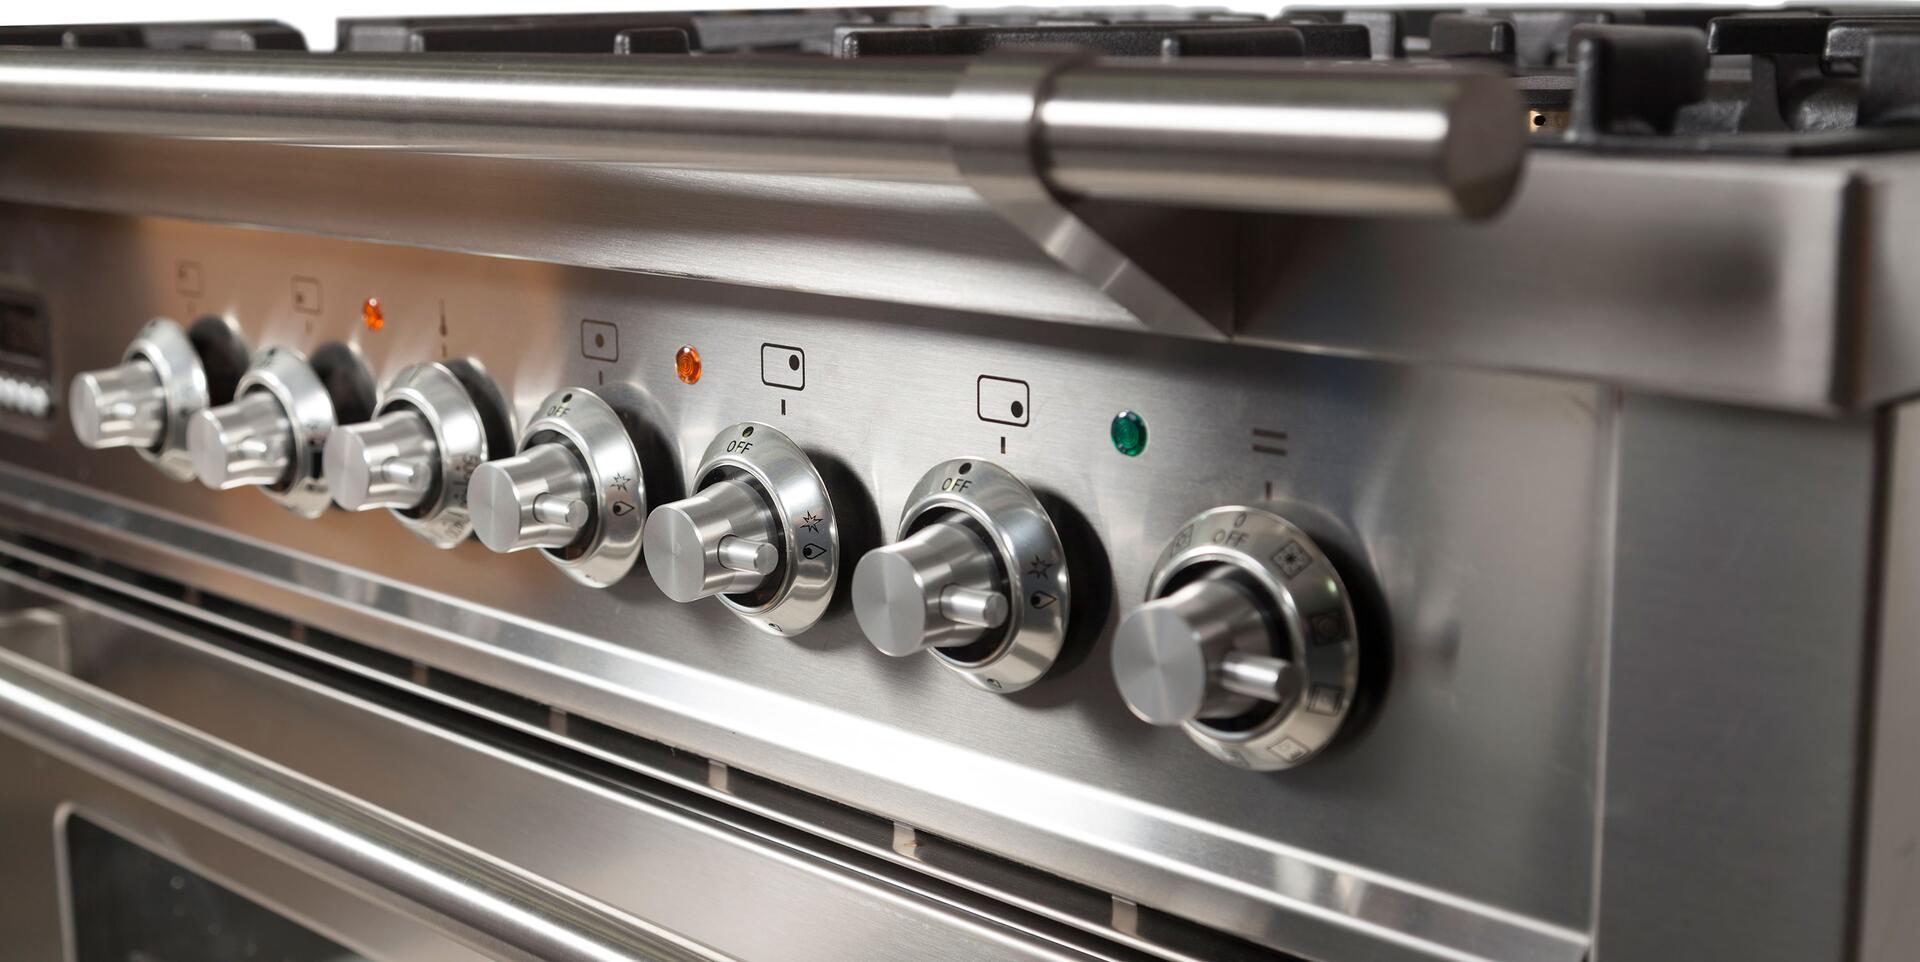 Ilve Professional Plus UPW90FDMPI Freestanding Dual Fuel Range Stainless Steel, UPN90FDMPIX Handle Details